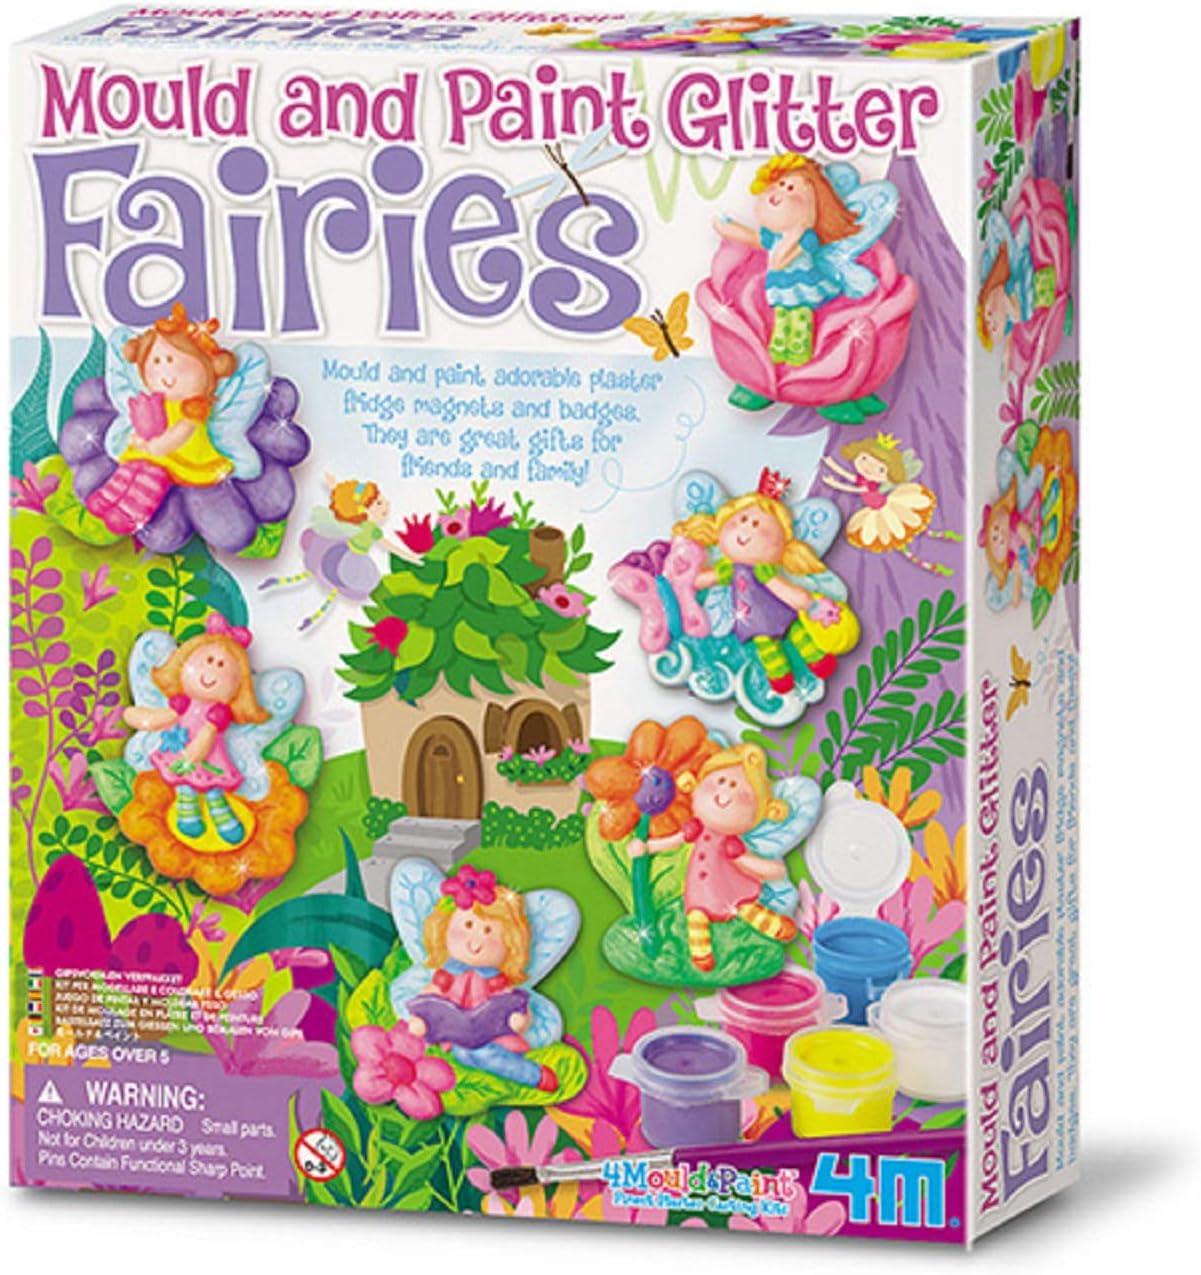 Great Gizmos 4M - Mould & Paint Glitter Fairy (004M3524)